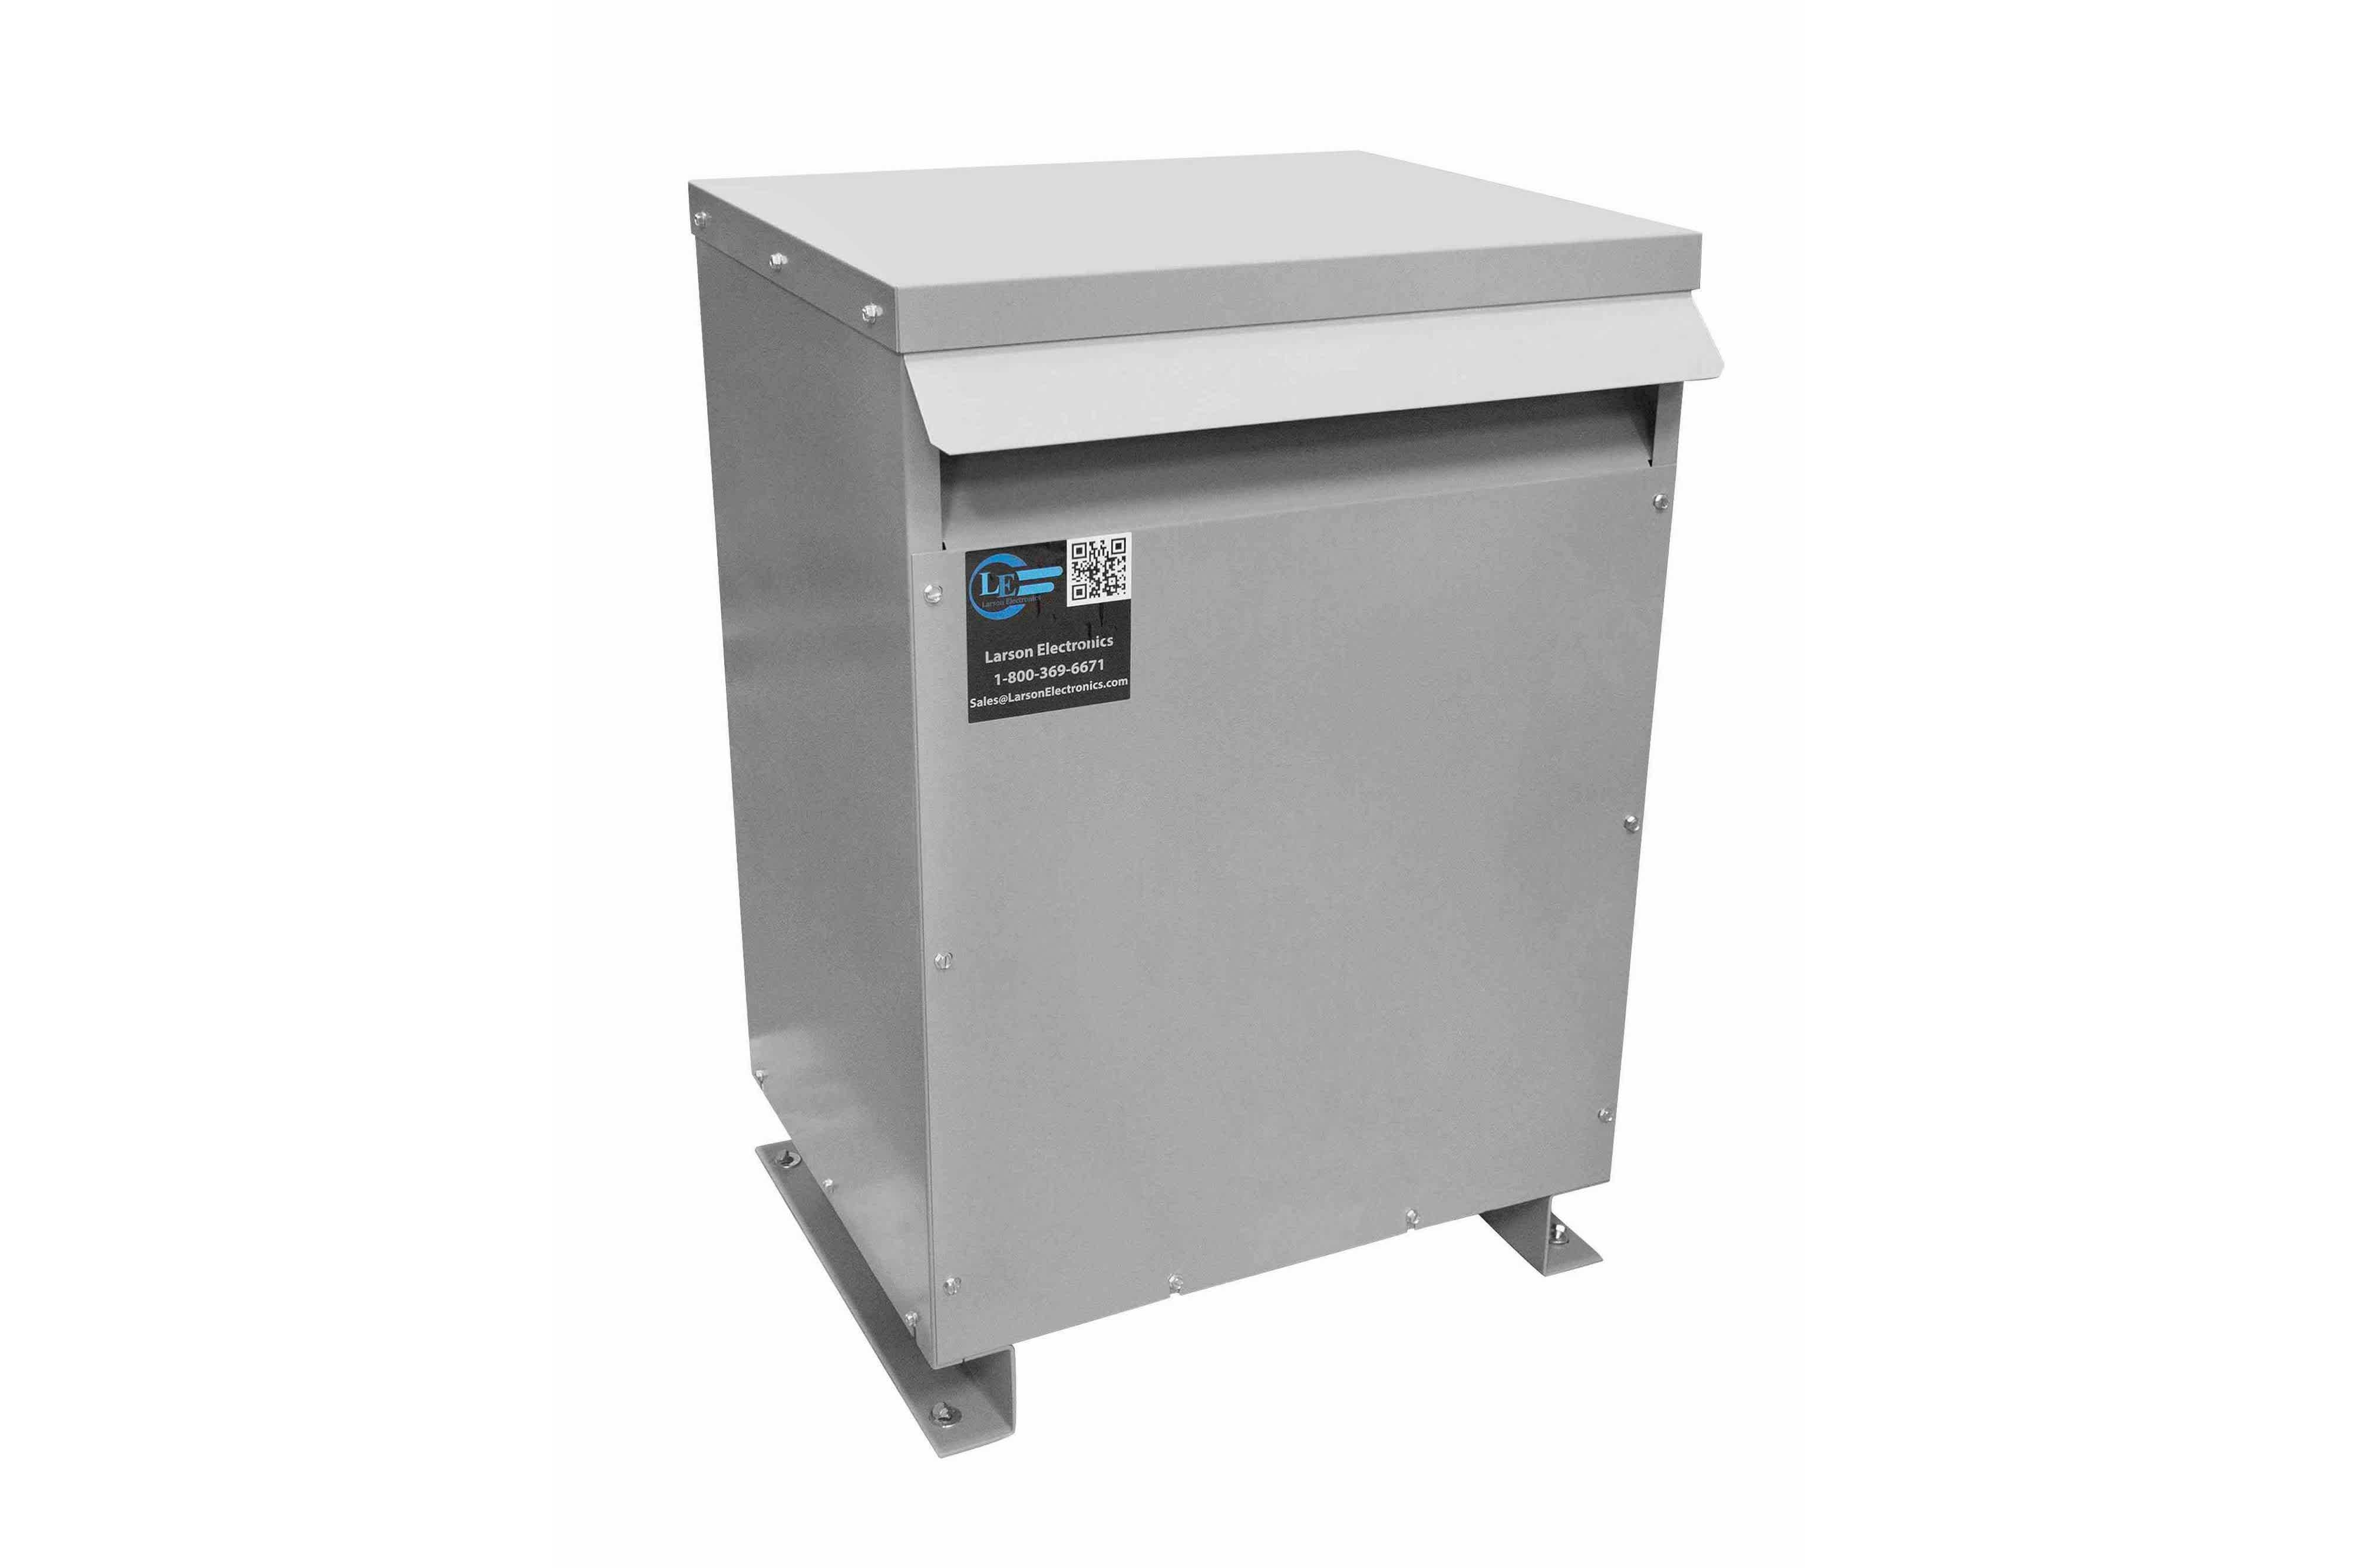 15 kVA 3PH Isolation Transformer, 380V Wye Primary, 240V/120 Delta Secondary, N3R, Ventilated, 60 Hz